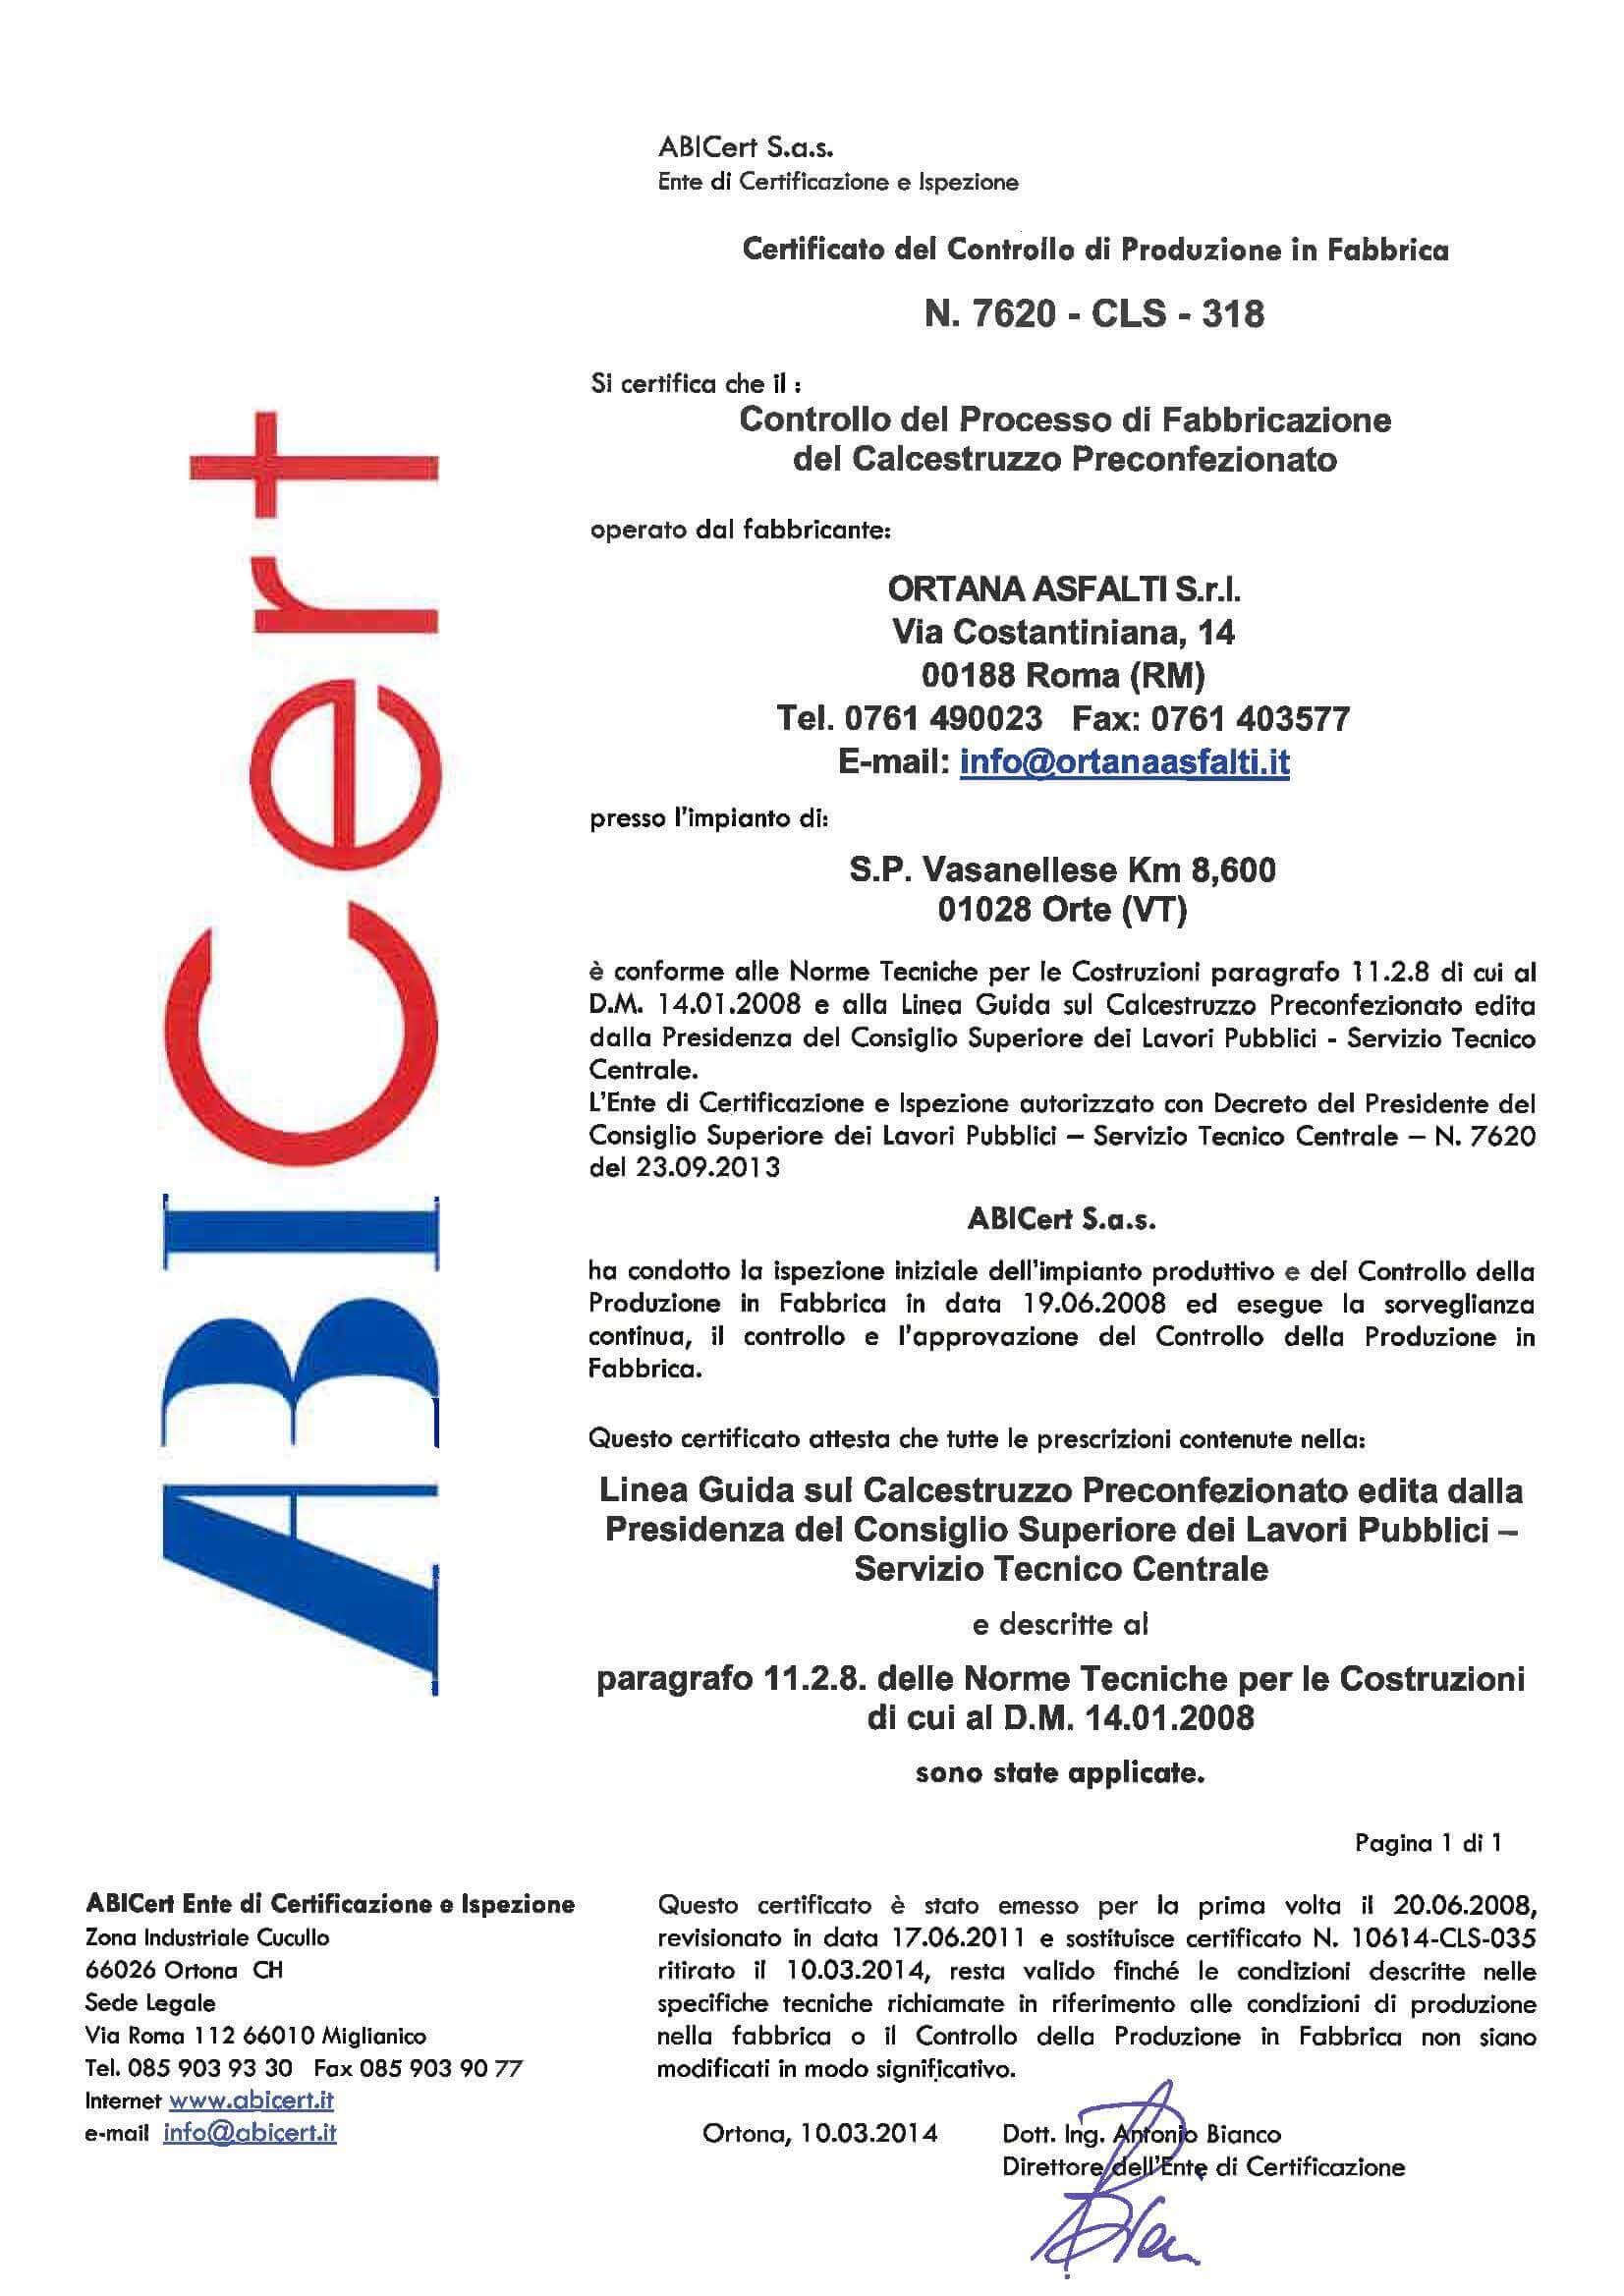 ABI Cert Certificate